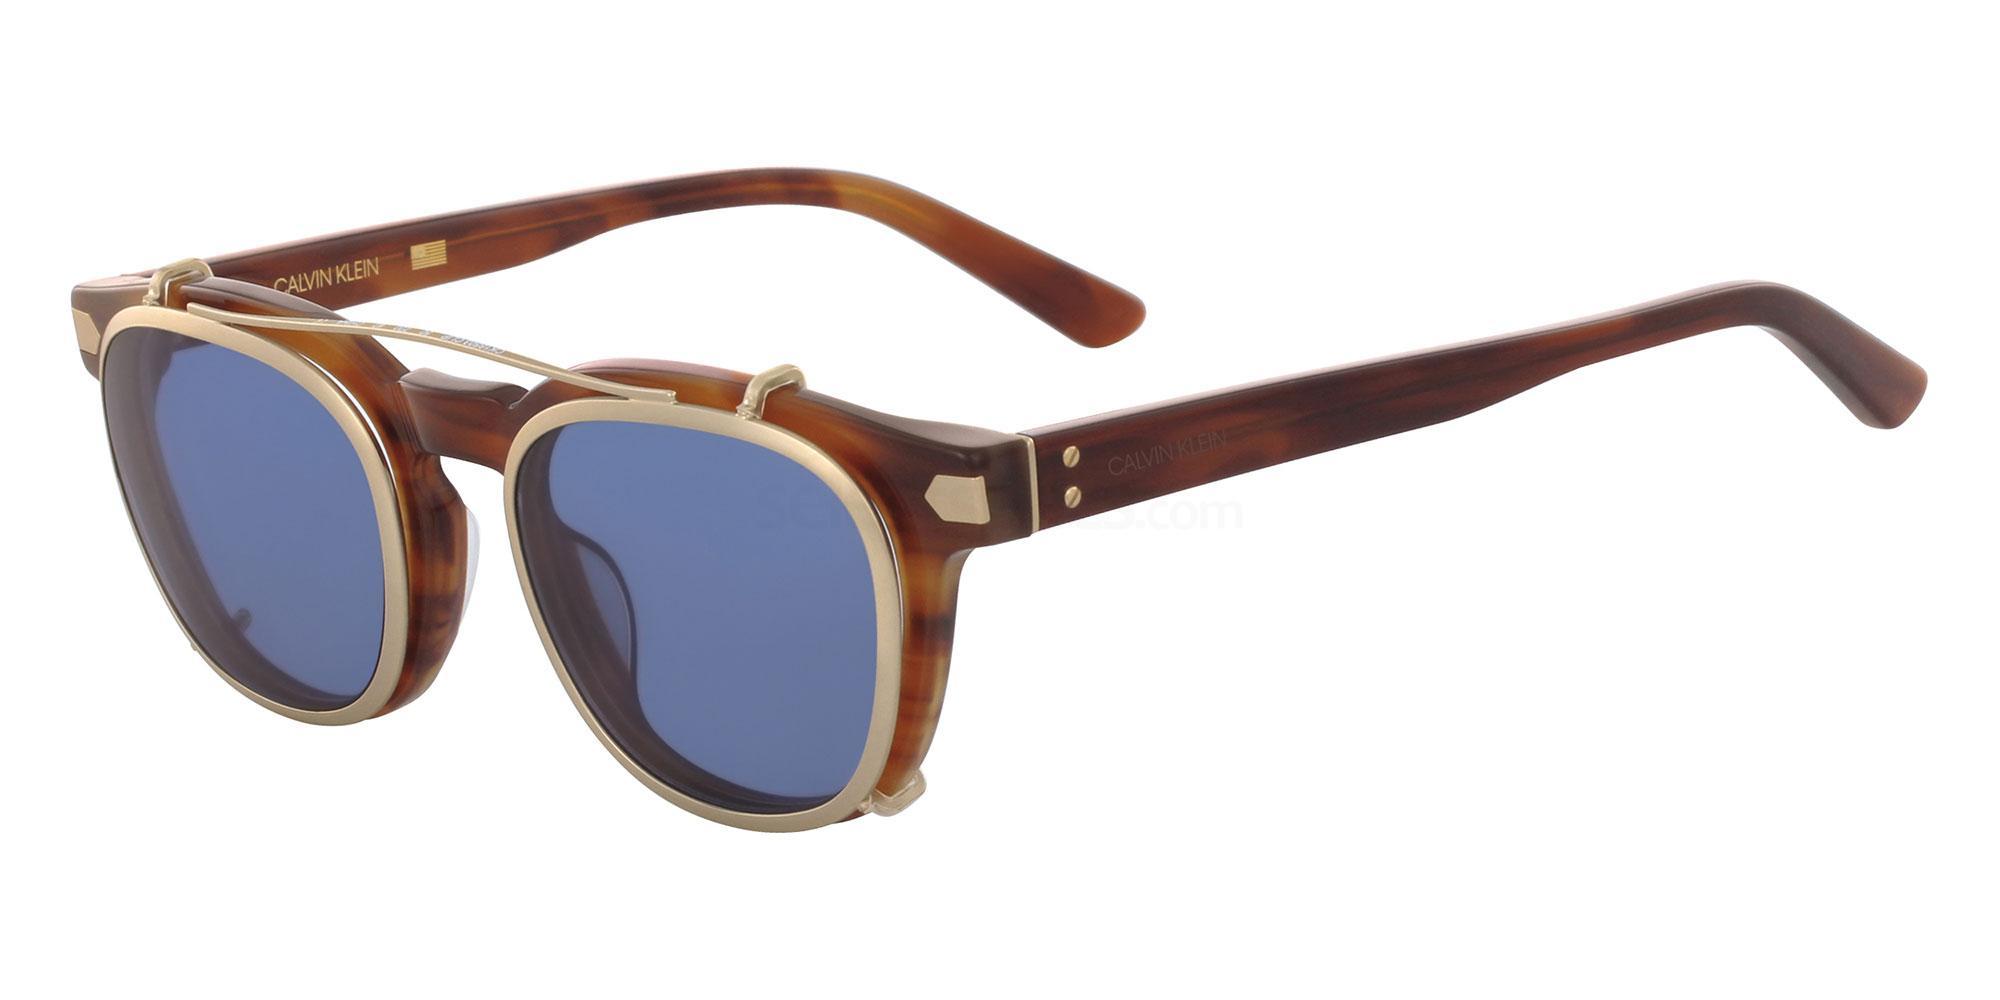 220 CK18503 CLIP SET Sunglasses, Calvin Klein